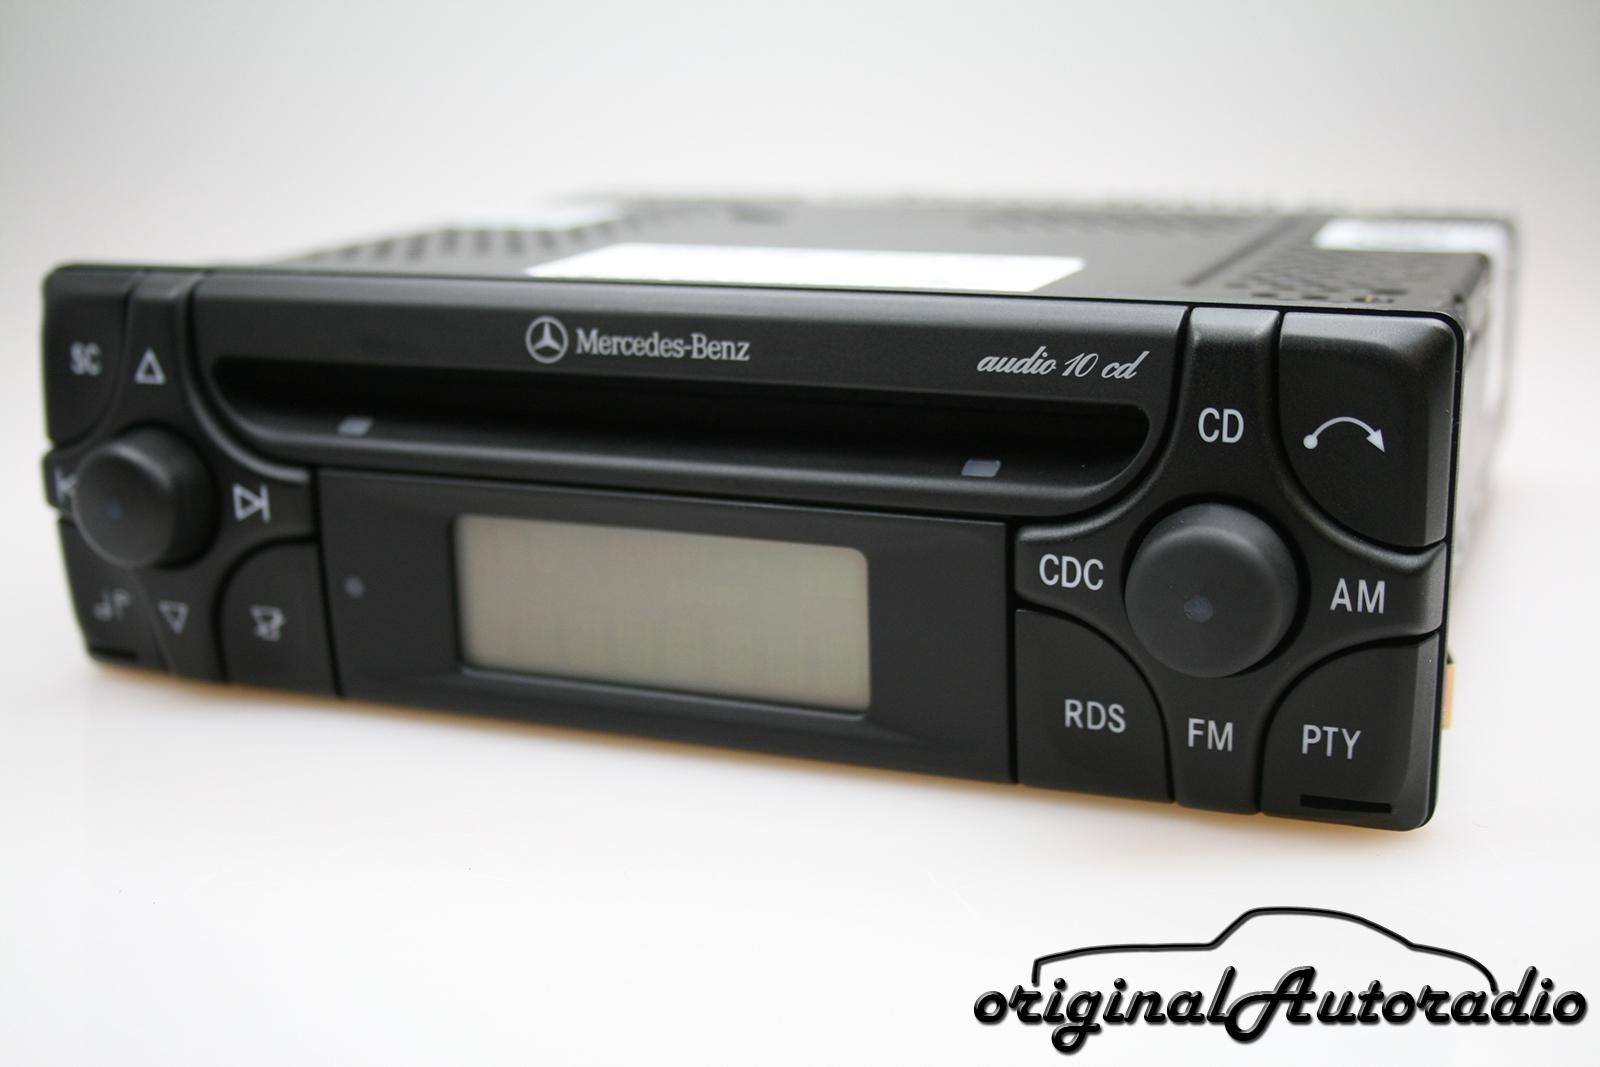 original mercedes audio 10 cd mf2910 cd r. Black Bedroom Furniture Sets. Home Design Ideas